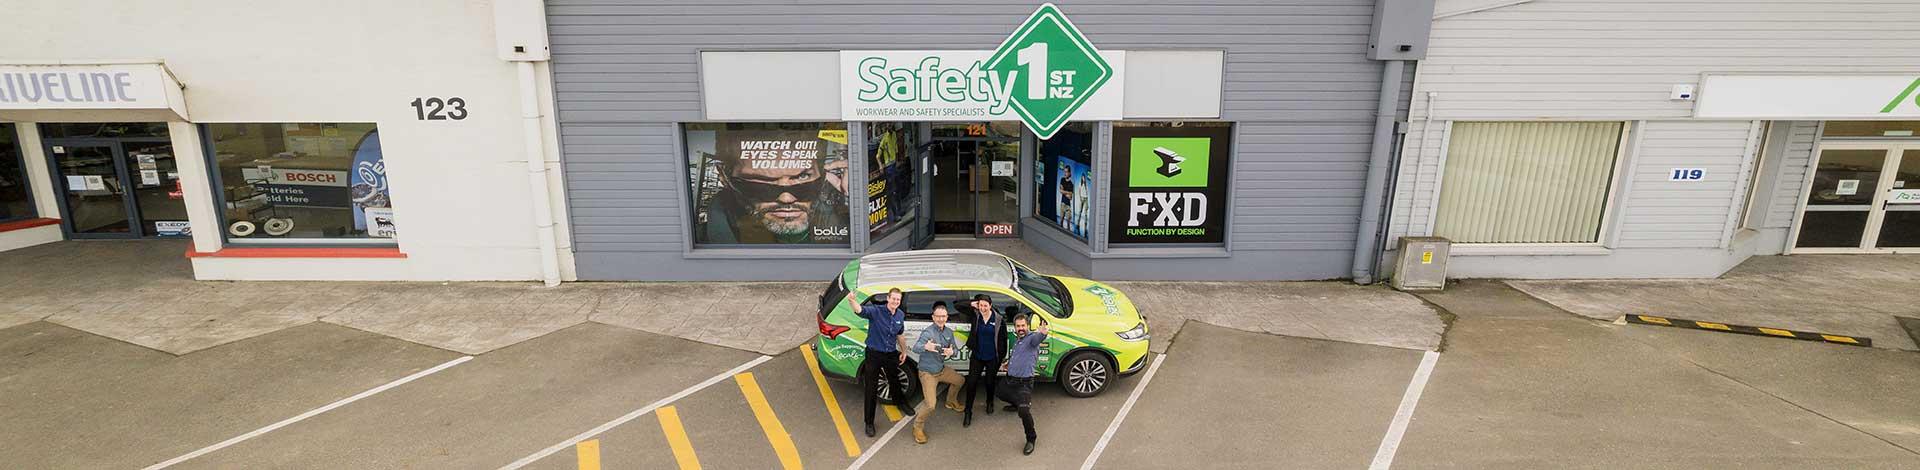 Safety 1st NZ Banner Image